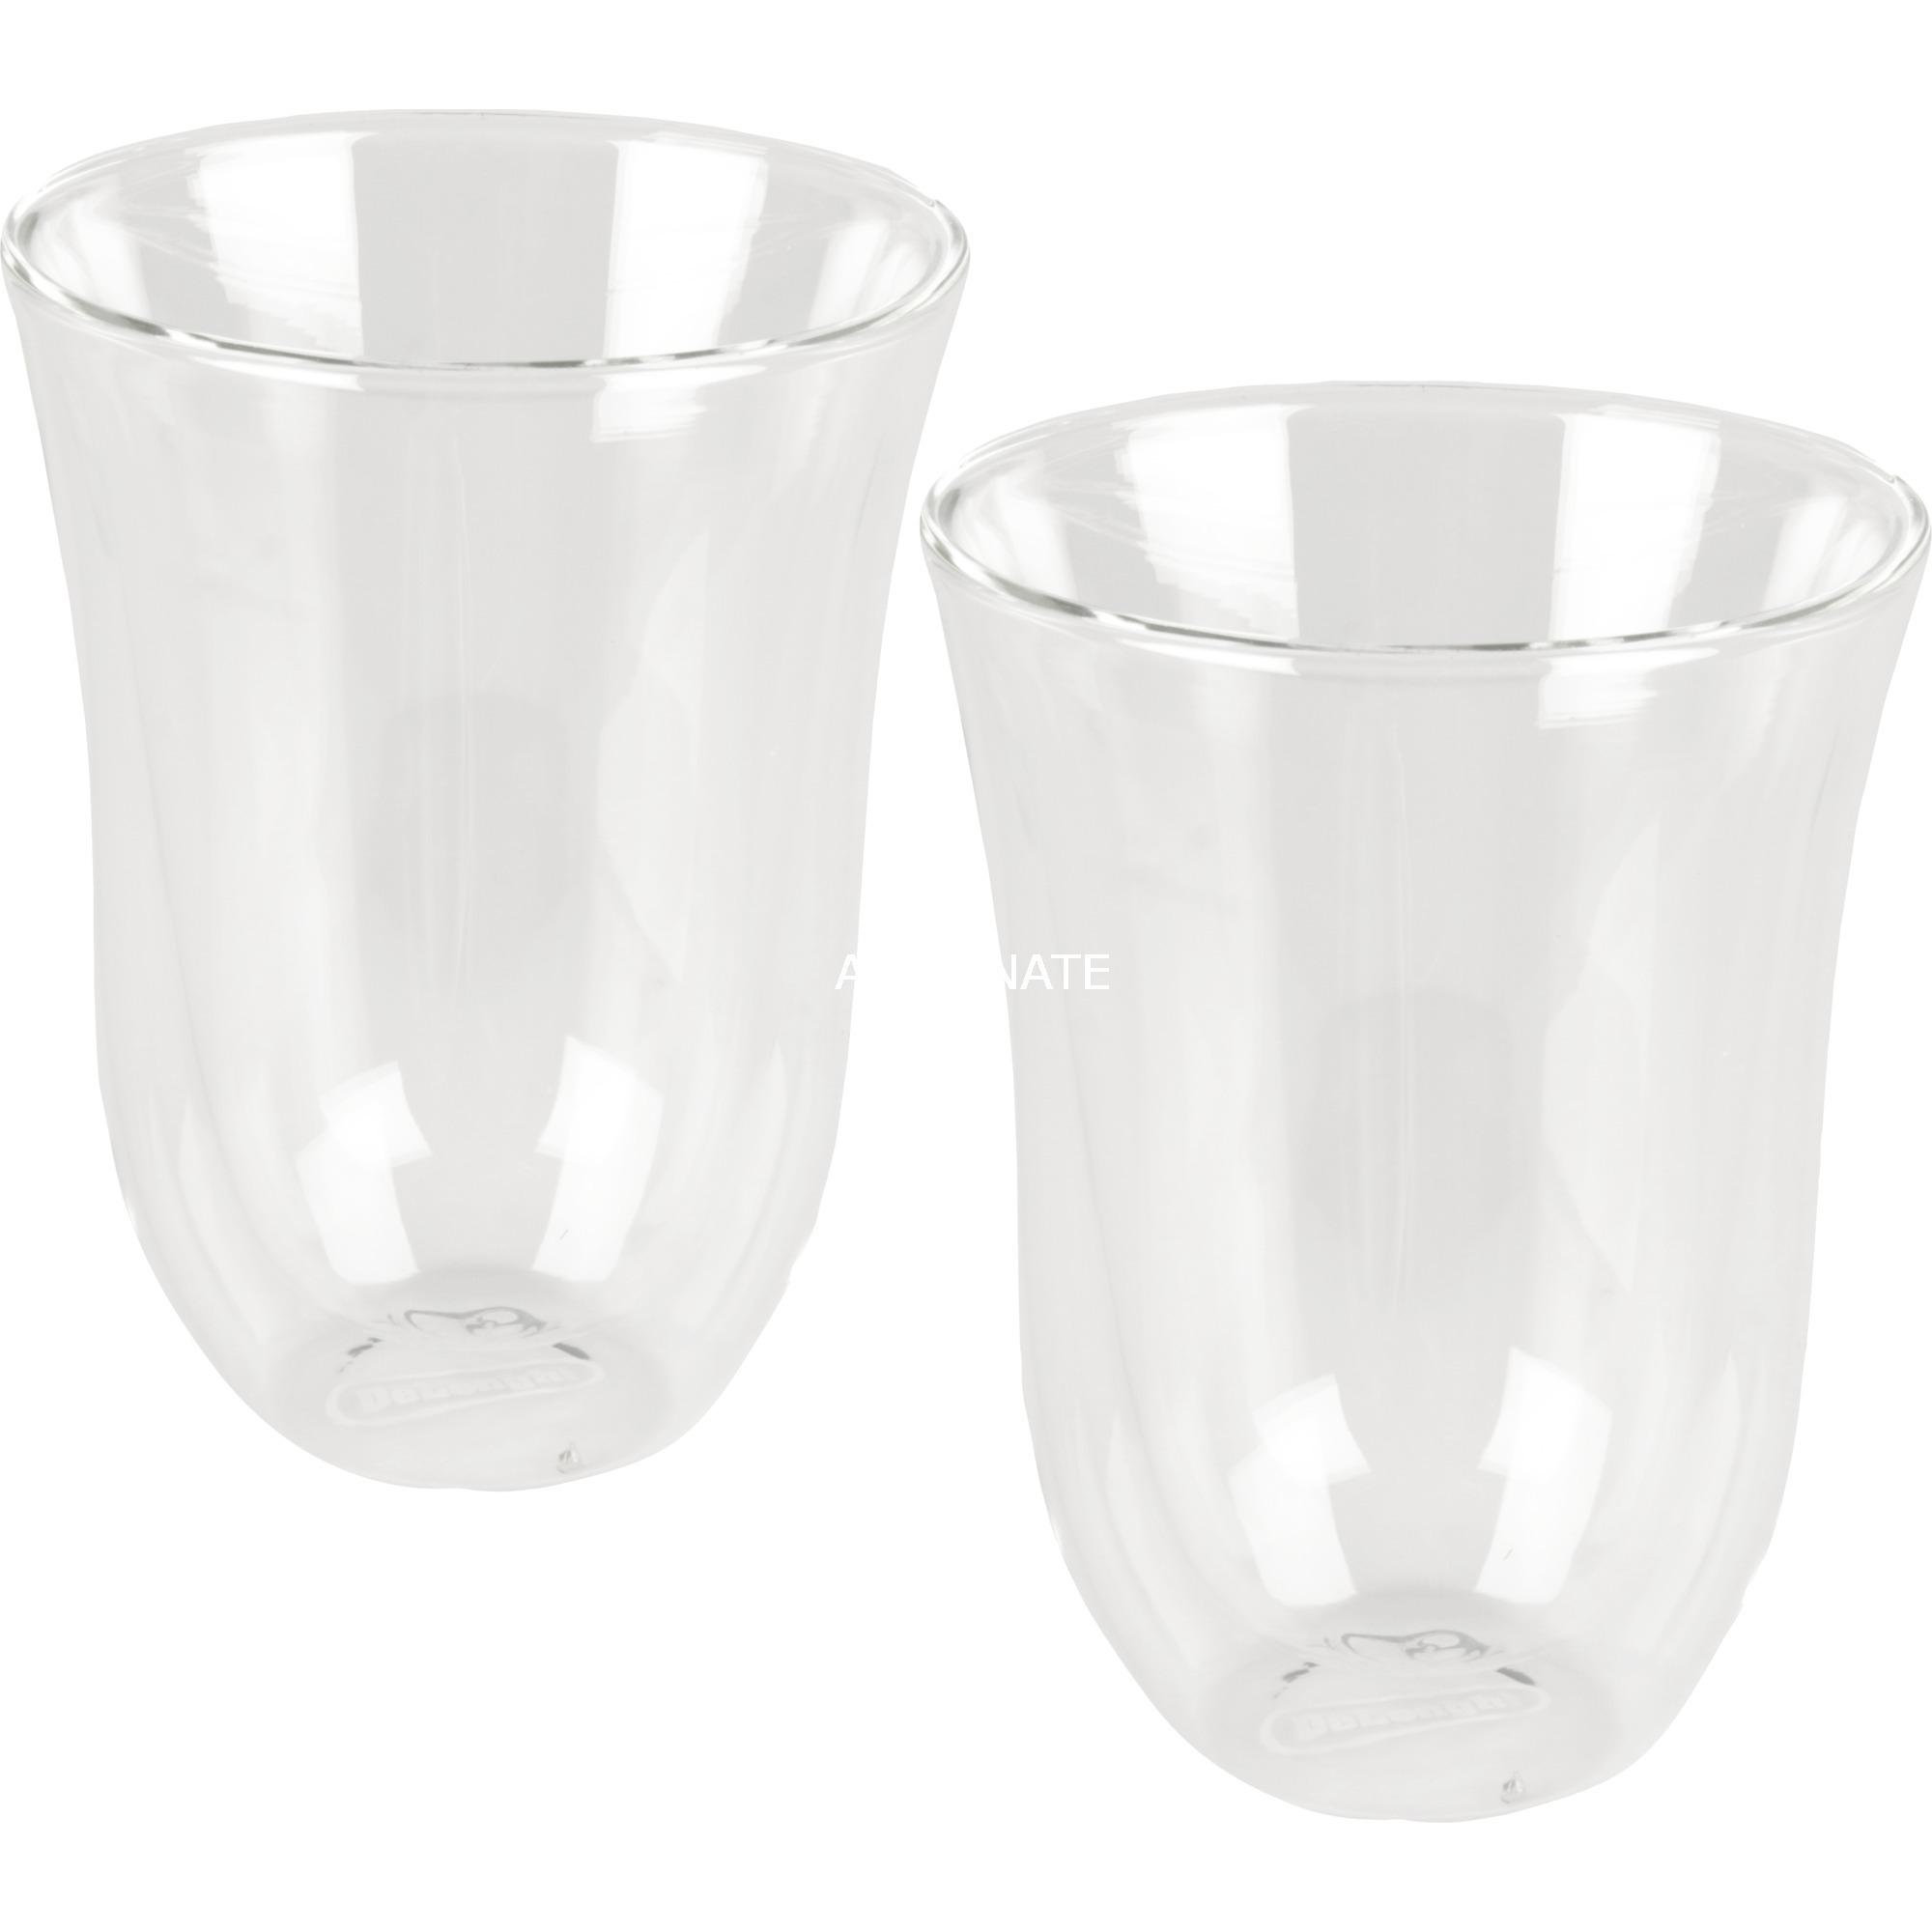 5513214611 vaso de café Transparente 2 pieza(s) 220 ml, Vidrio